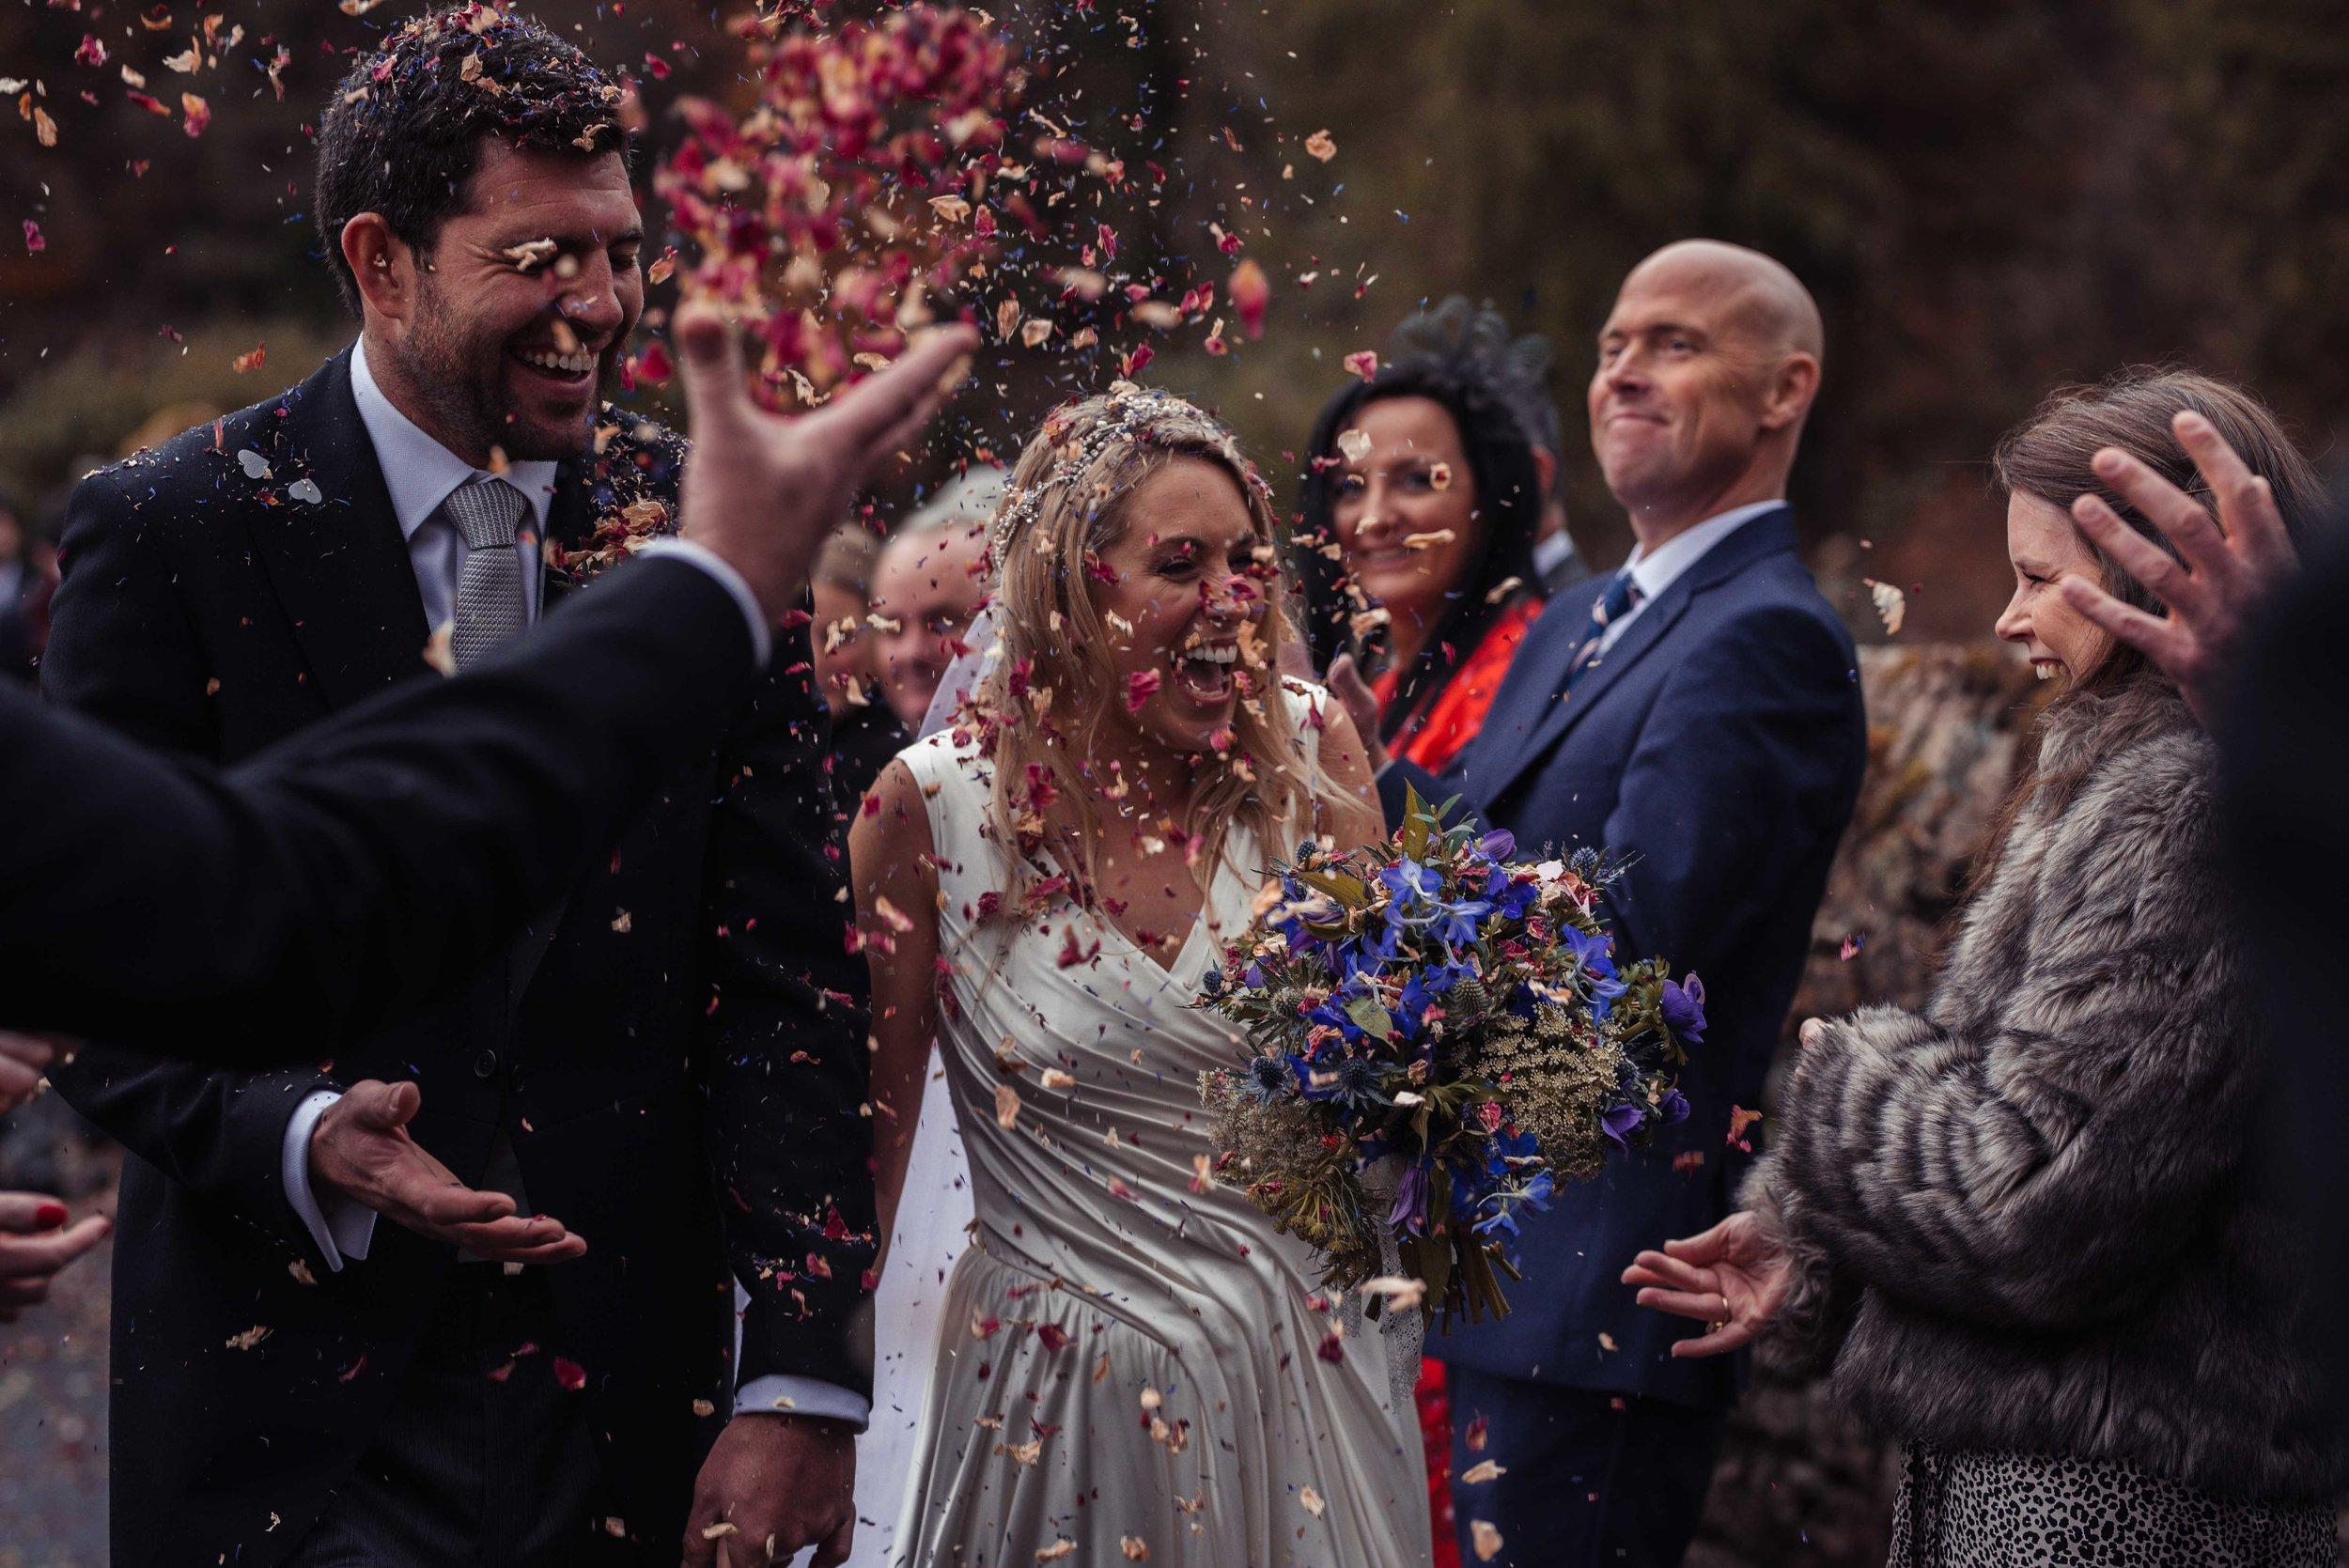 Askham-Hall-Wedding-Photography-42.jpg